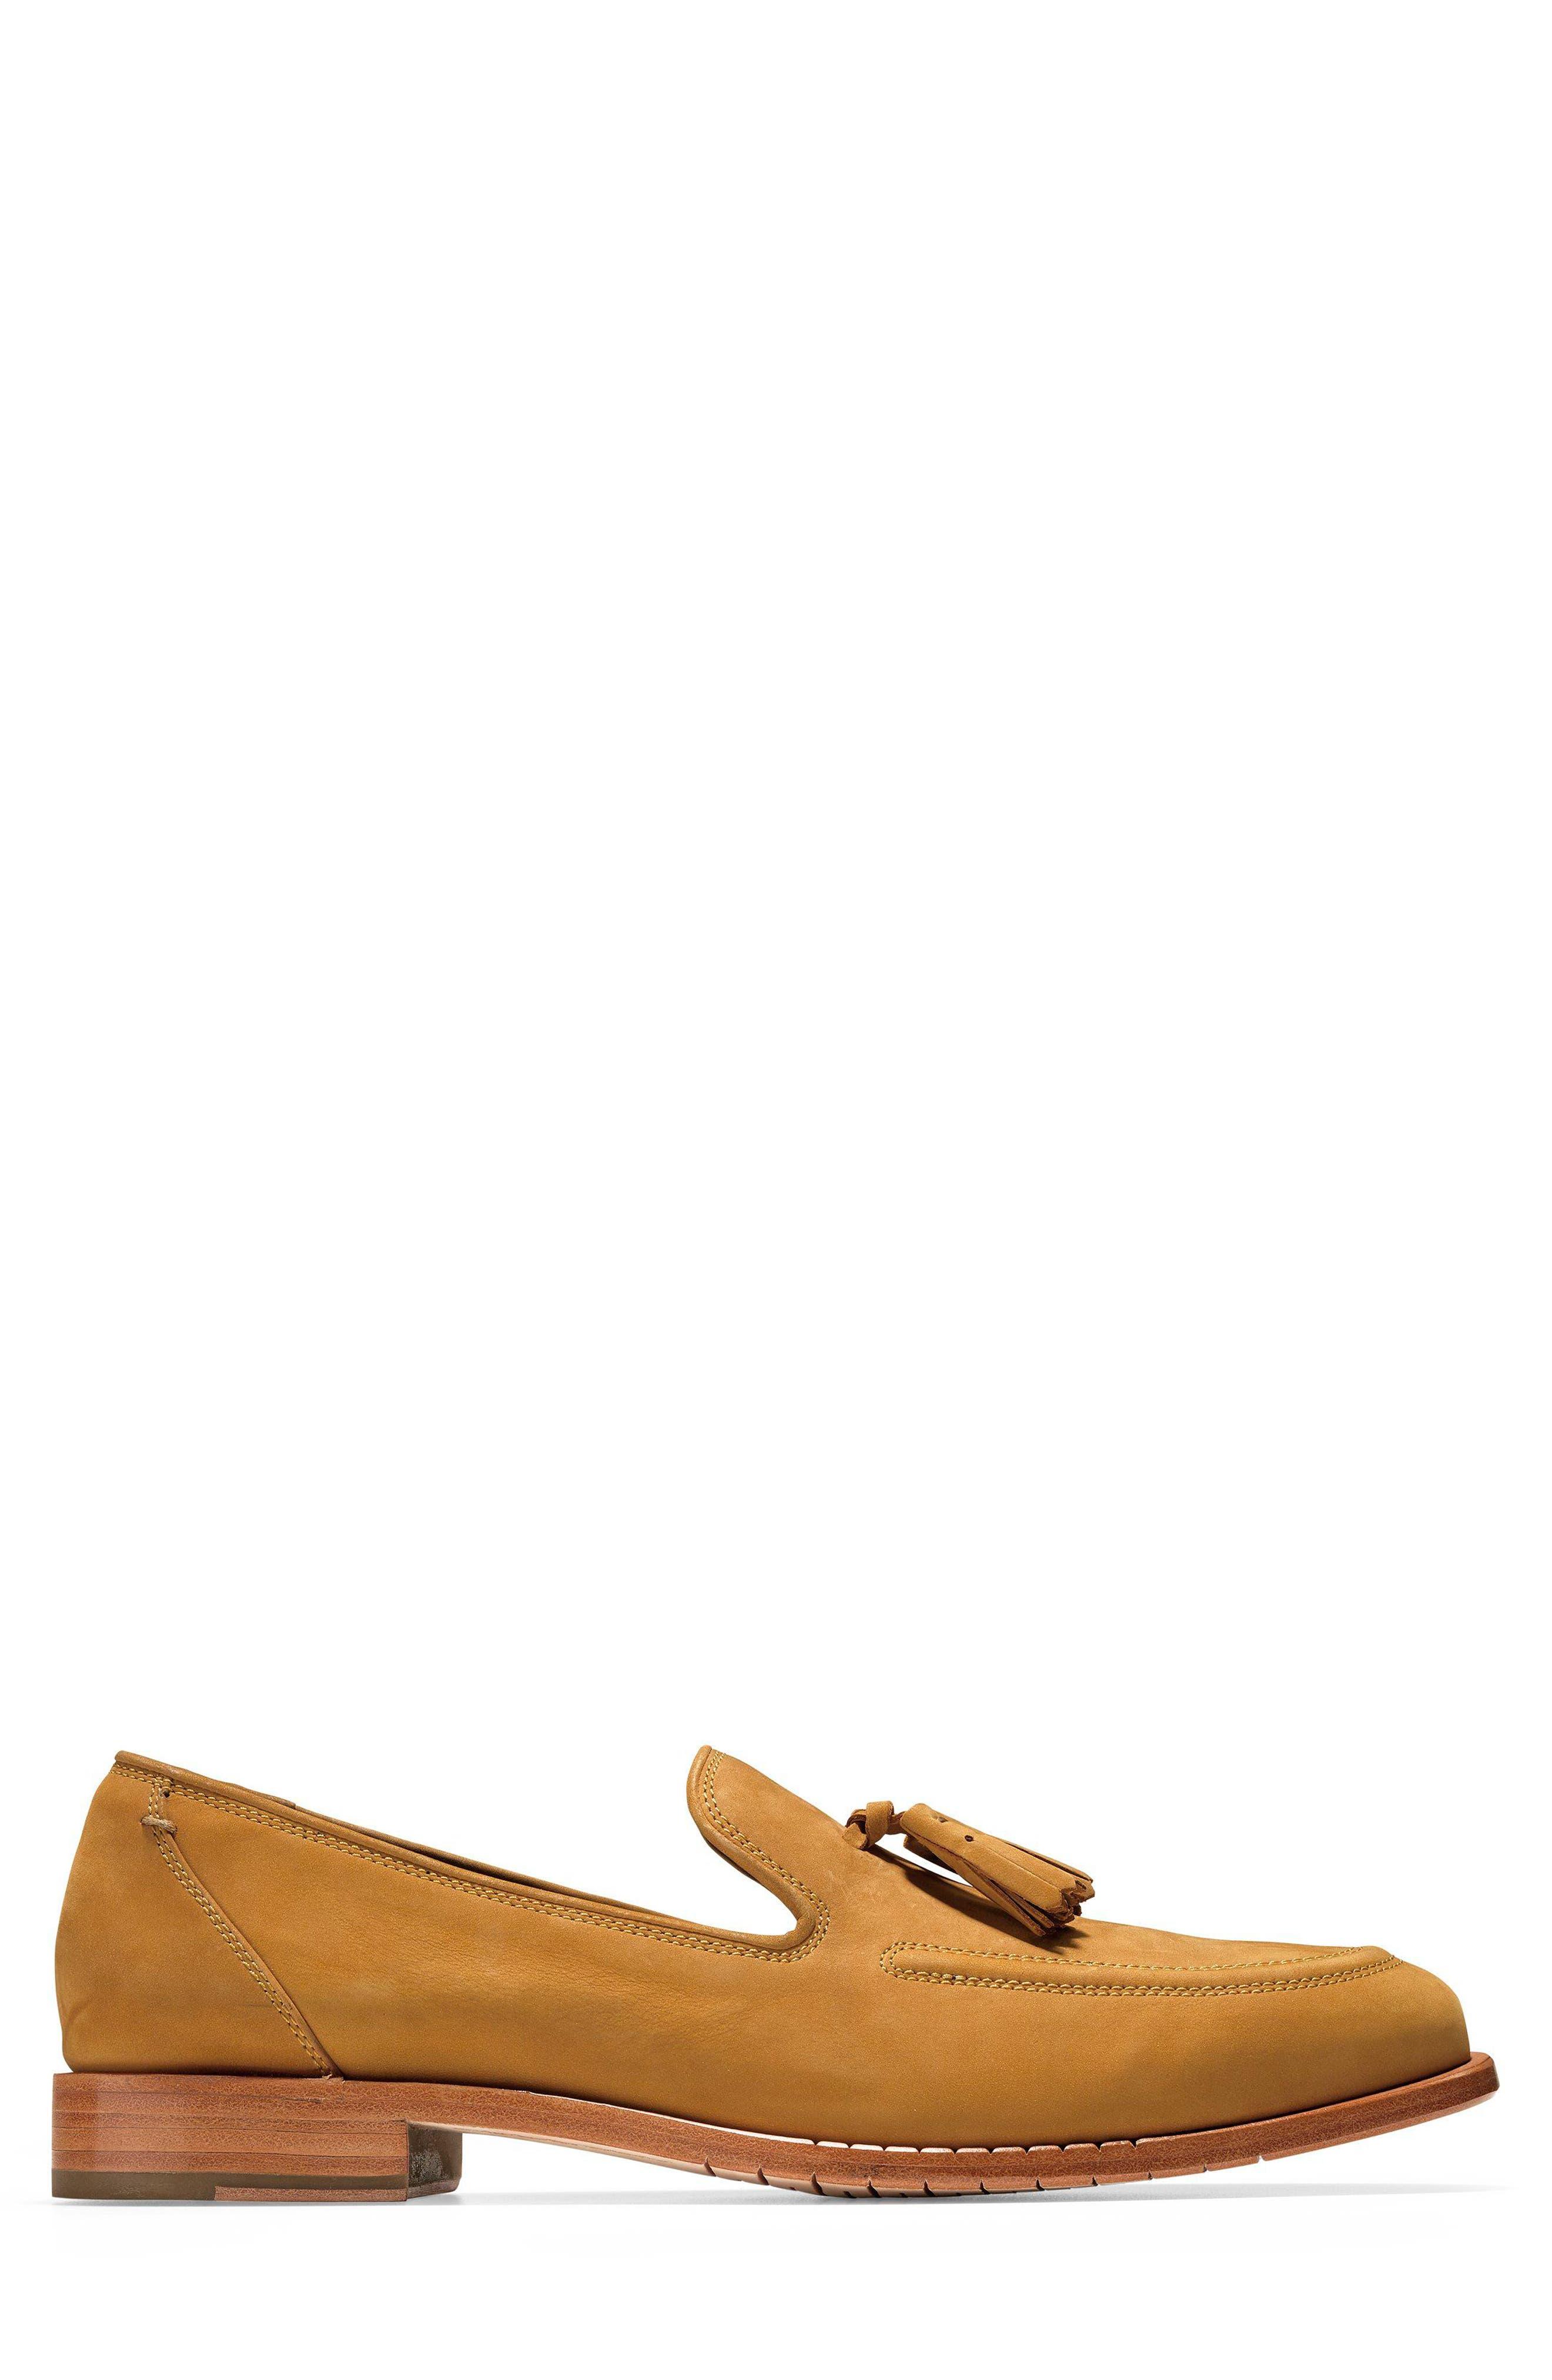 Washington Grand Tassel Loafer,                             Alternate thumbnail 3, color,                             Cathay Spice Nubuck